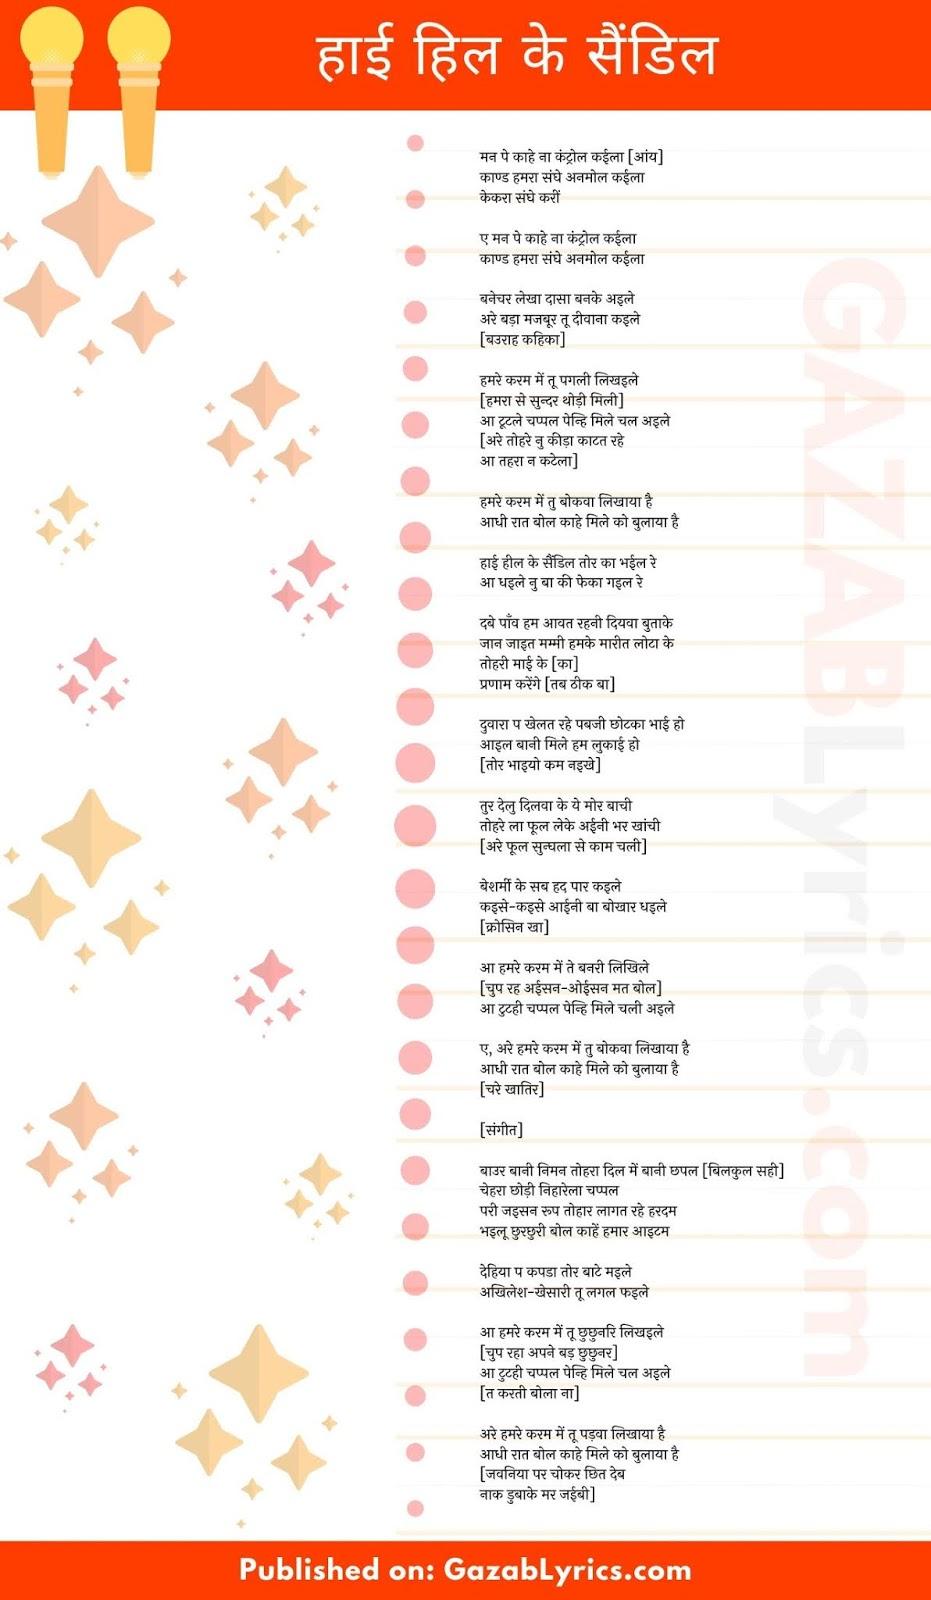 High Heel Ke Sandil song lyrics image